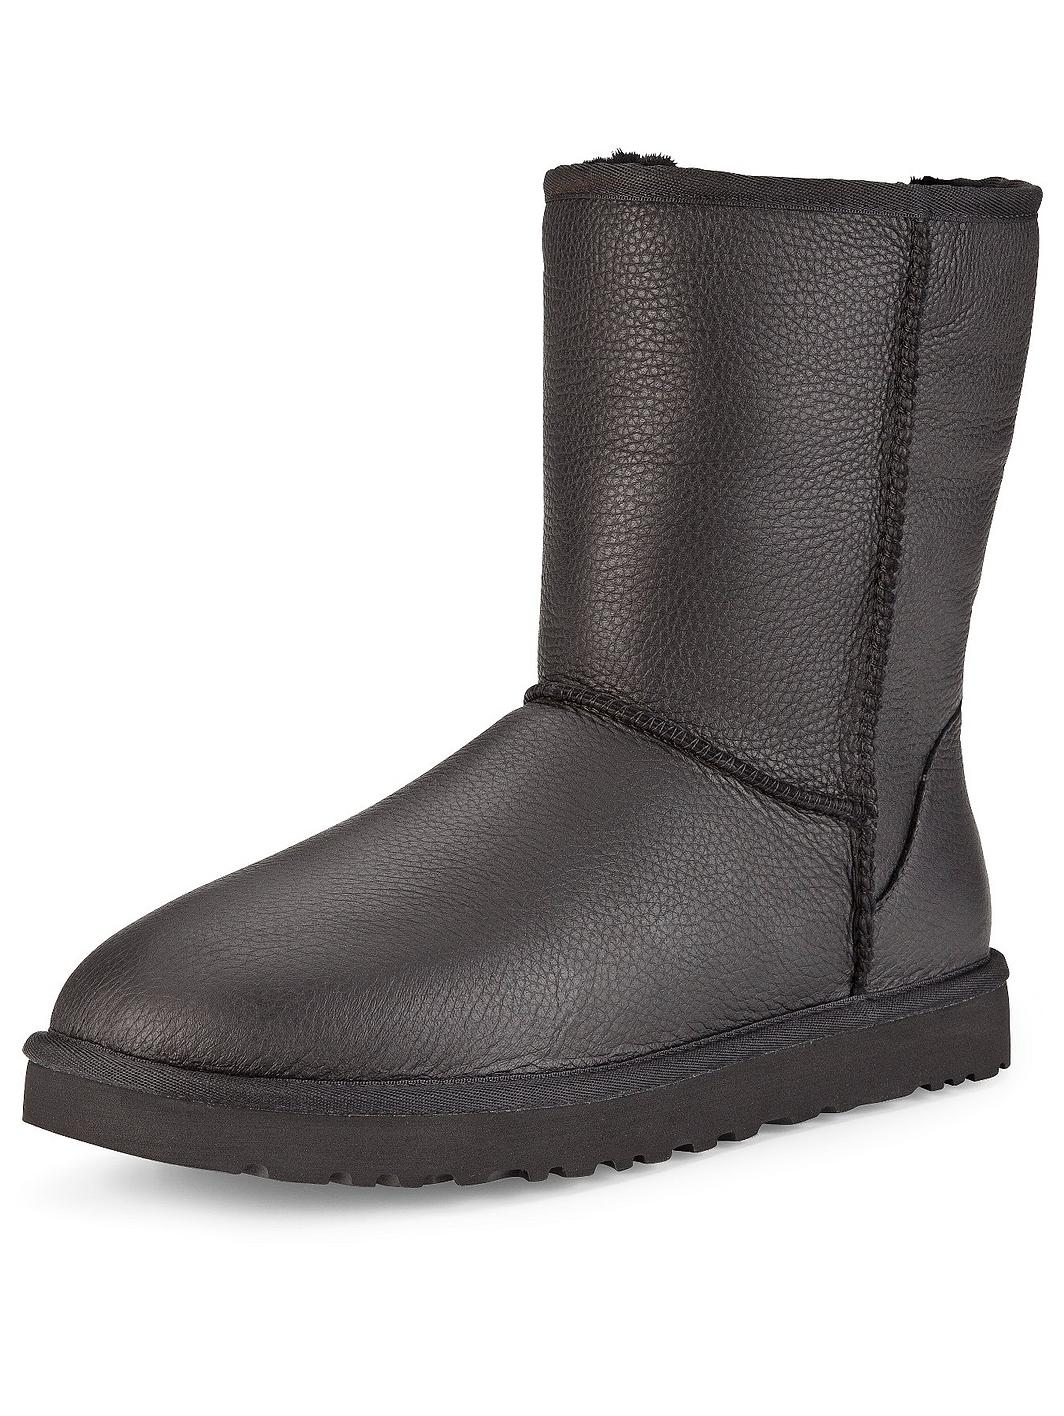 ugg australia classic leather boots co uk